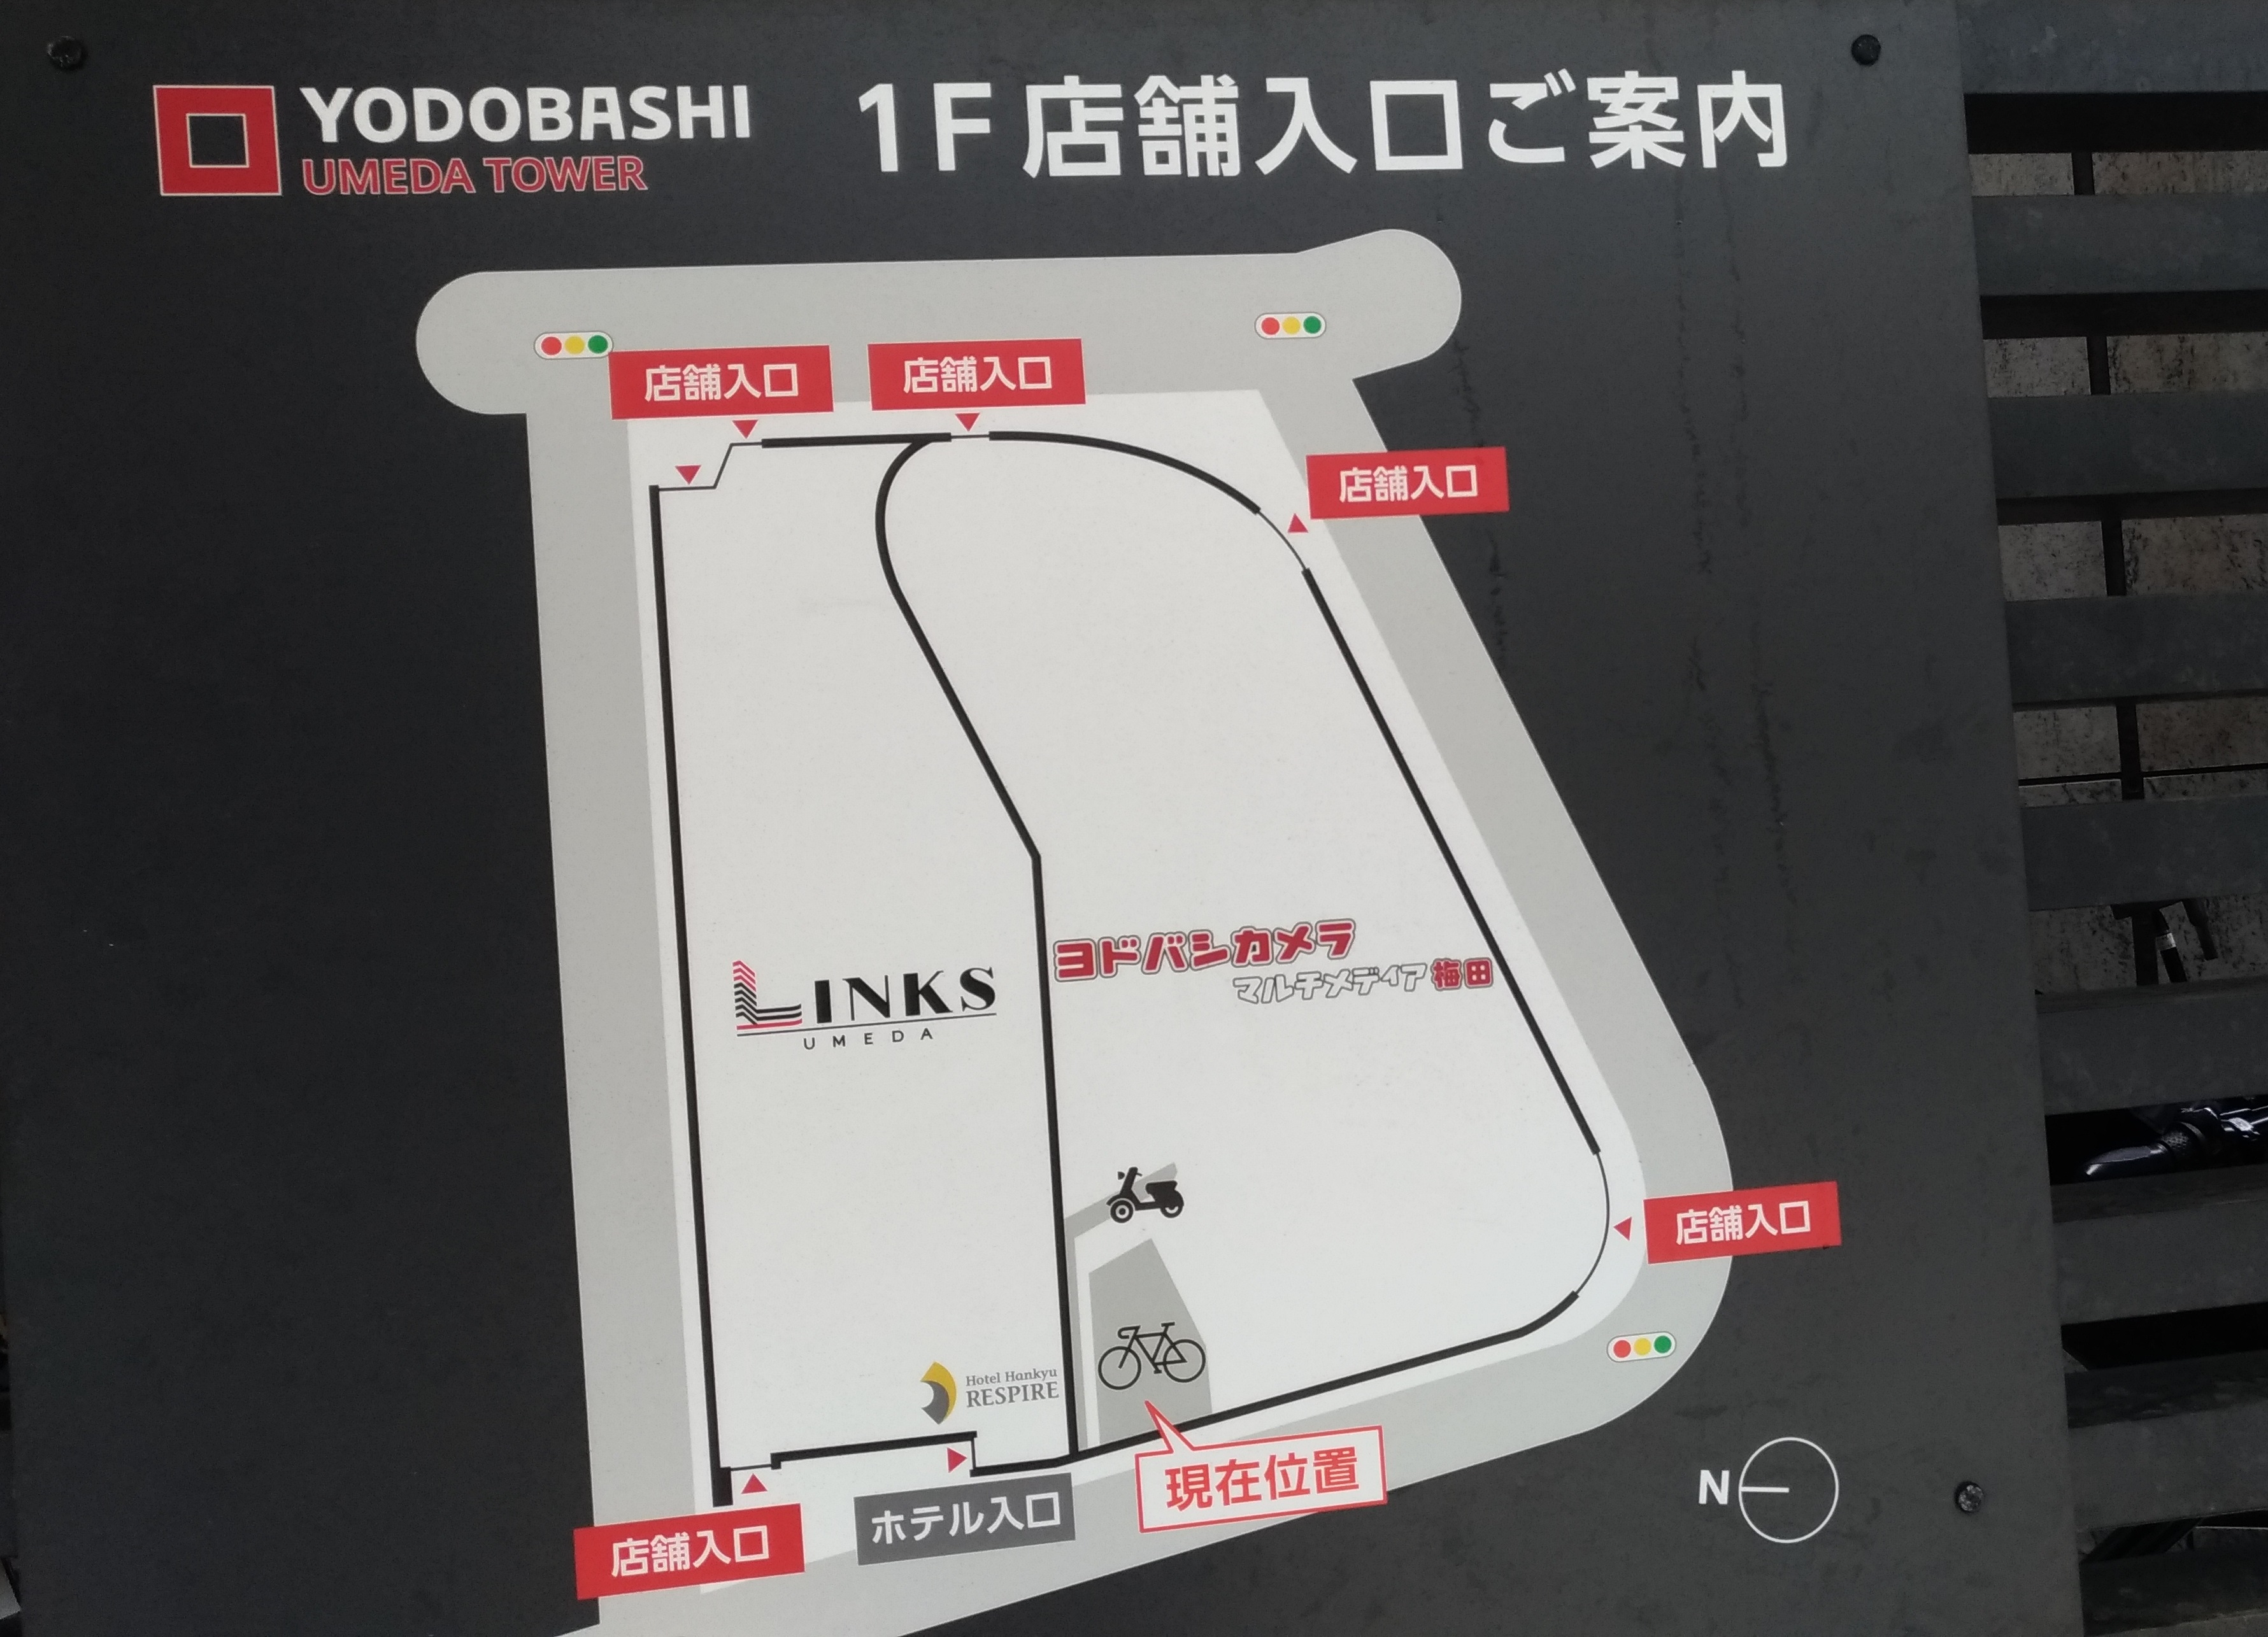 yodobashi_umeda_cycle_ryokin_2.jpg